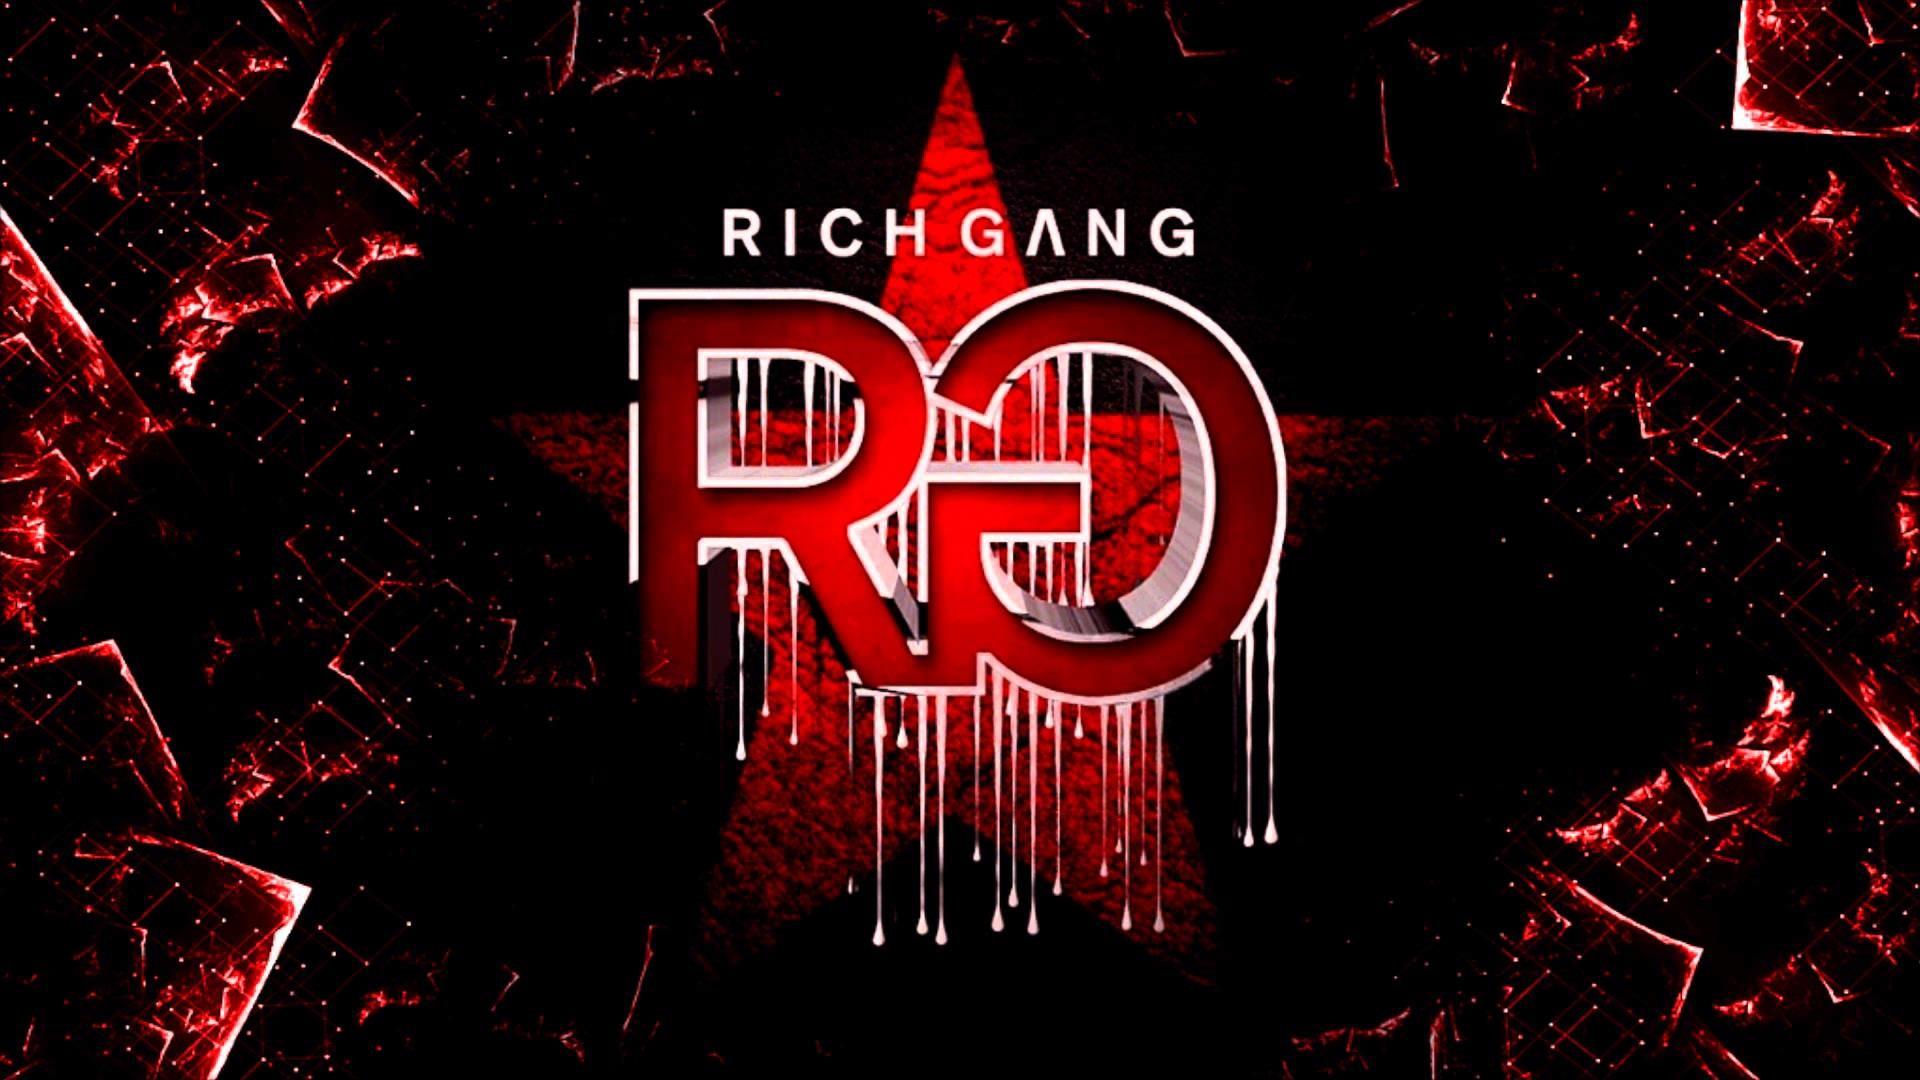 1920x1080 Rich Gang Logo Wallpaper Album Cover